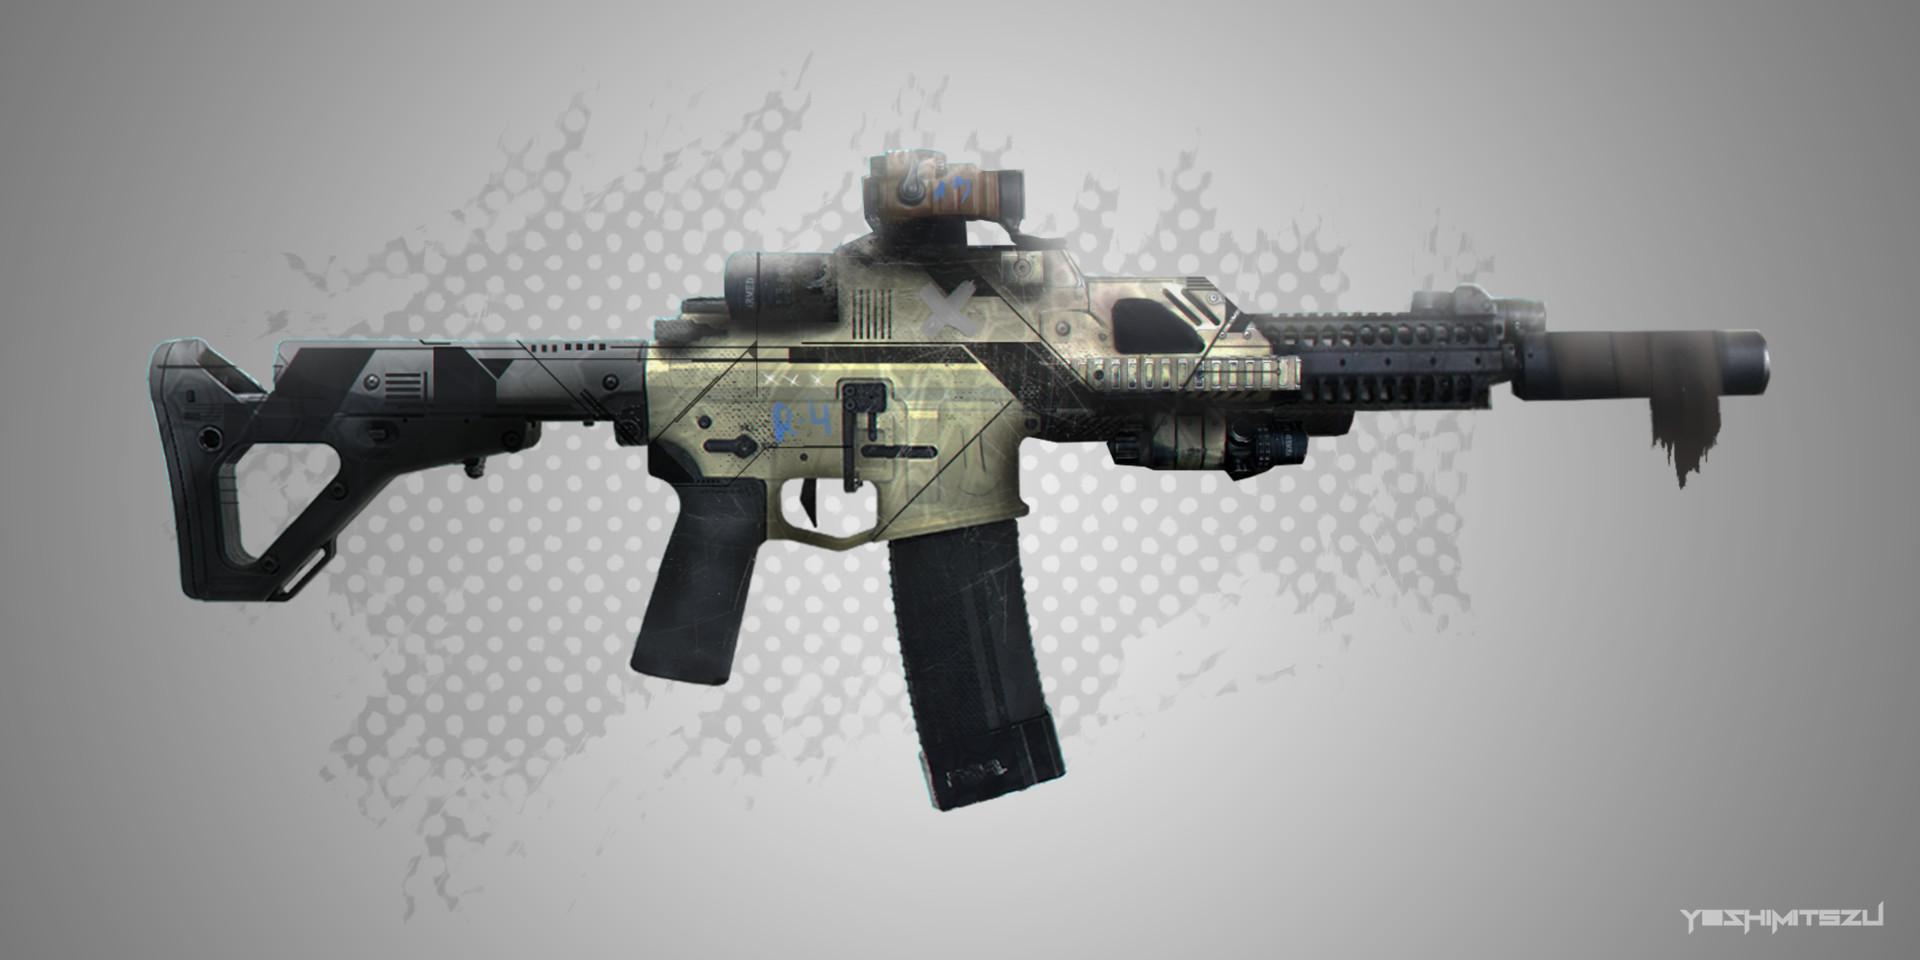 Anton krakowski rifle4